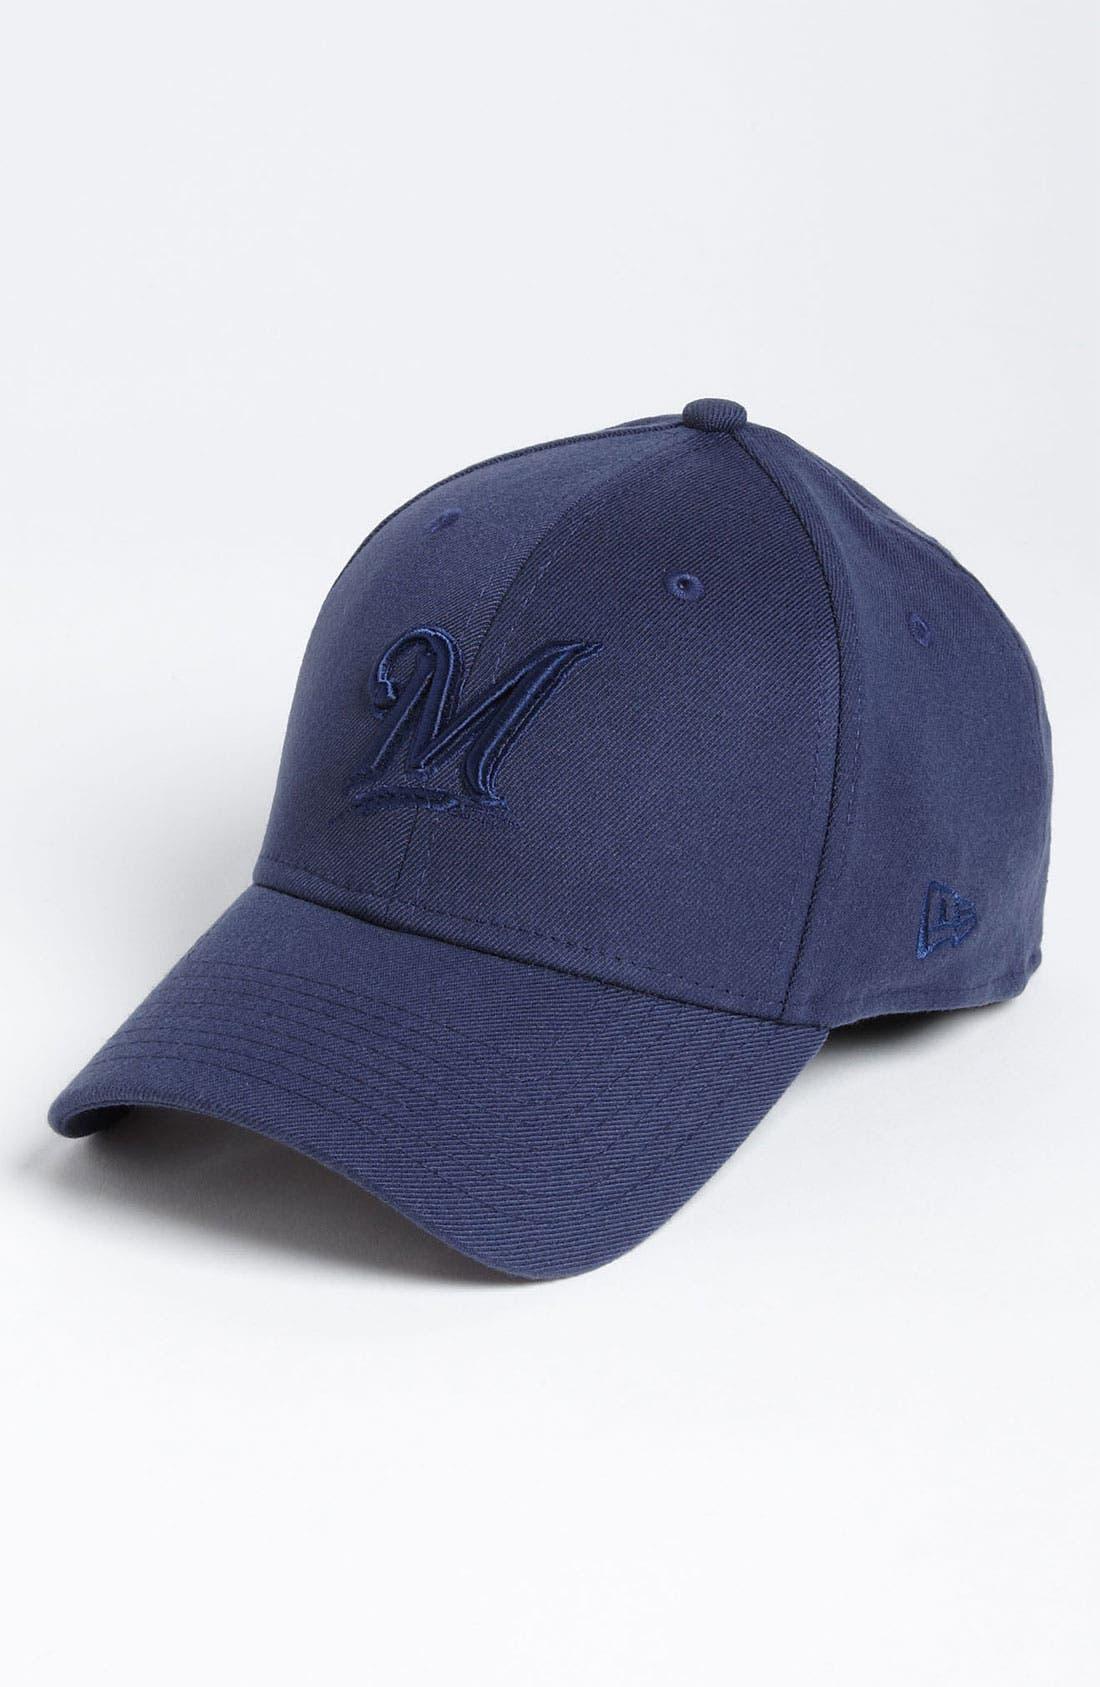 Alternate Image 1 Selected - New Era Cap 'Tonal Classic - Milwaukee Brewers' Fitted Baseball Cap